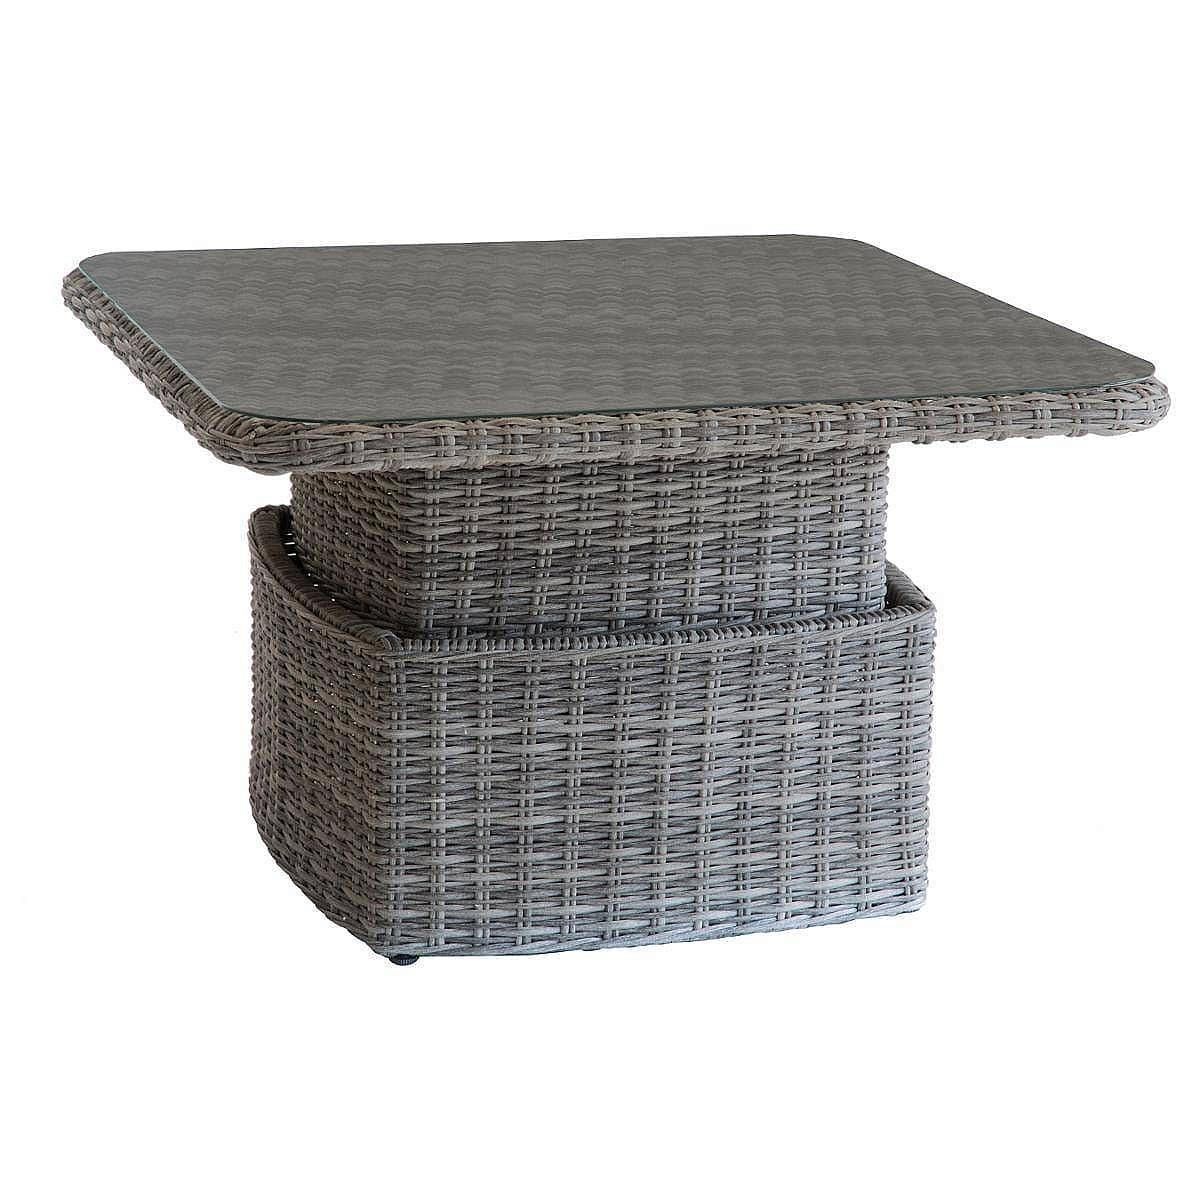 Ratanový stôl výsuvný jedálenský/odkladací 100x100 cm BORNEO (sivá)